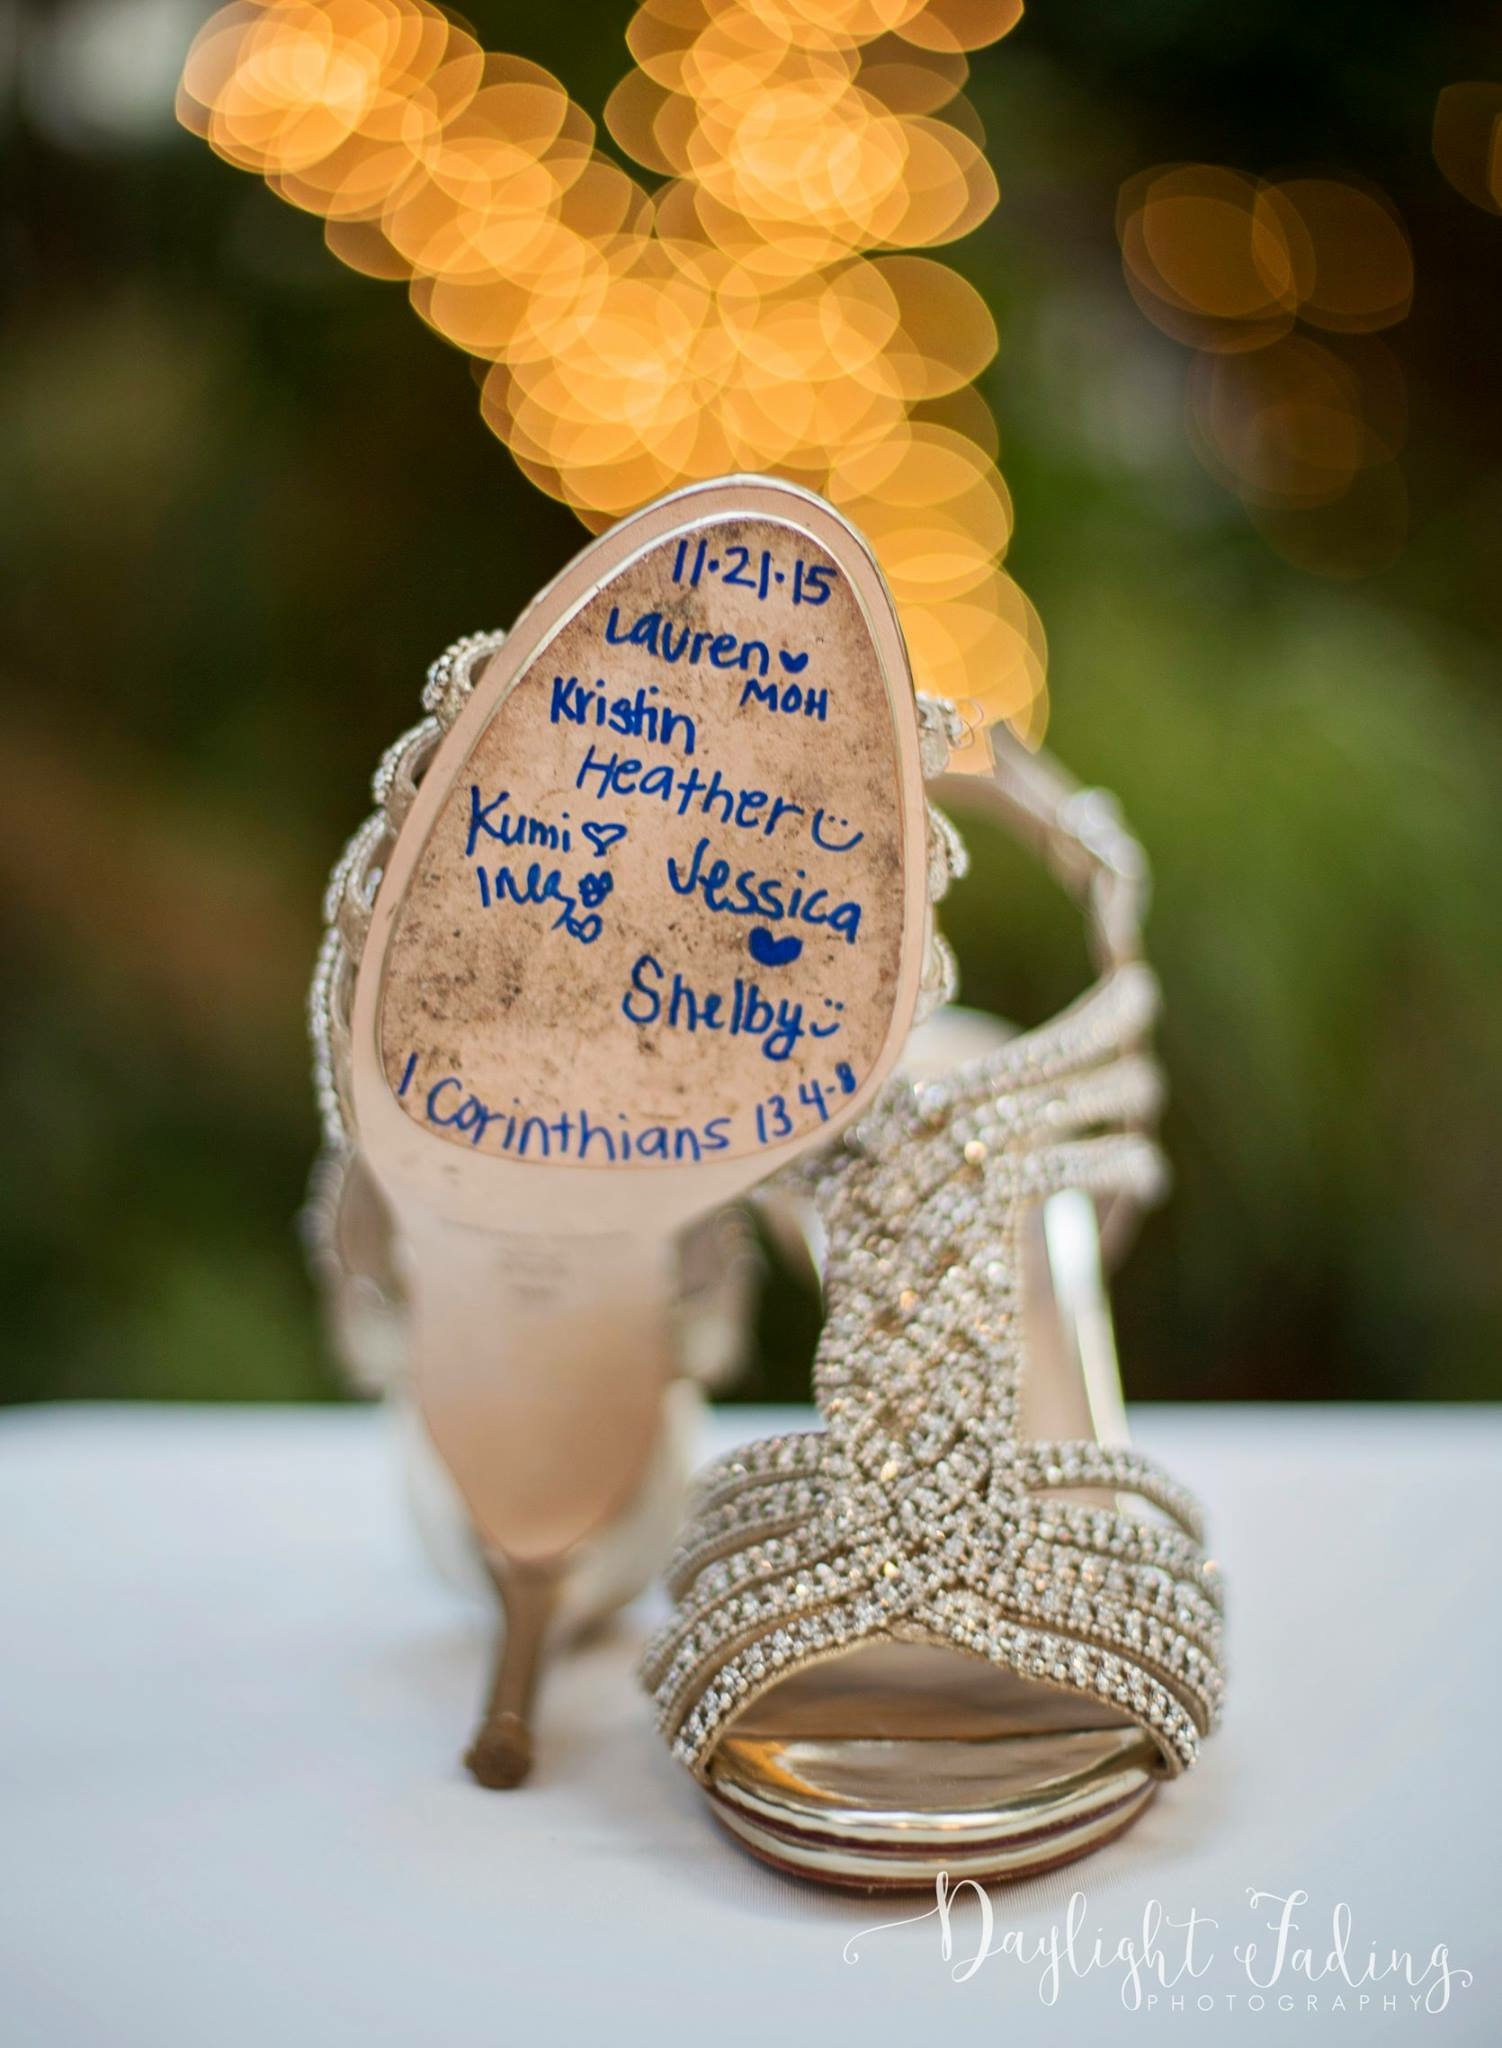 Creekwood Gardens Simsboro Louisiana Wedding Photographer - daylightfadingphotography.com